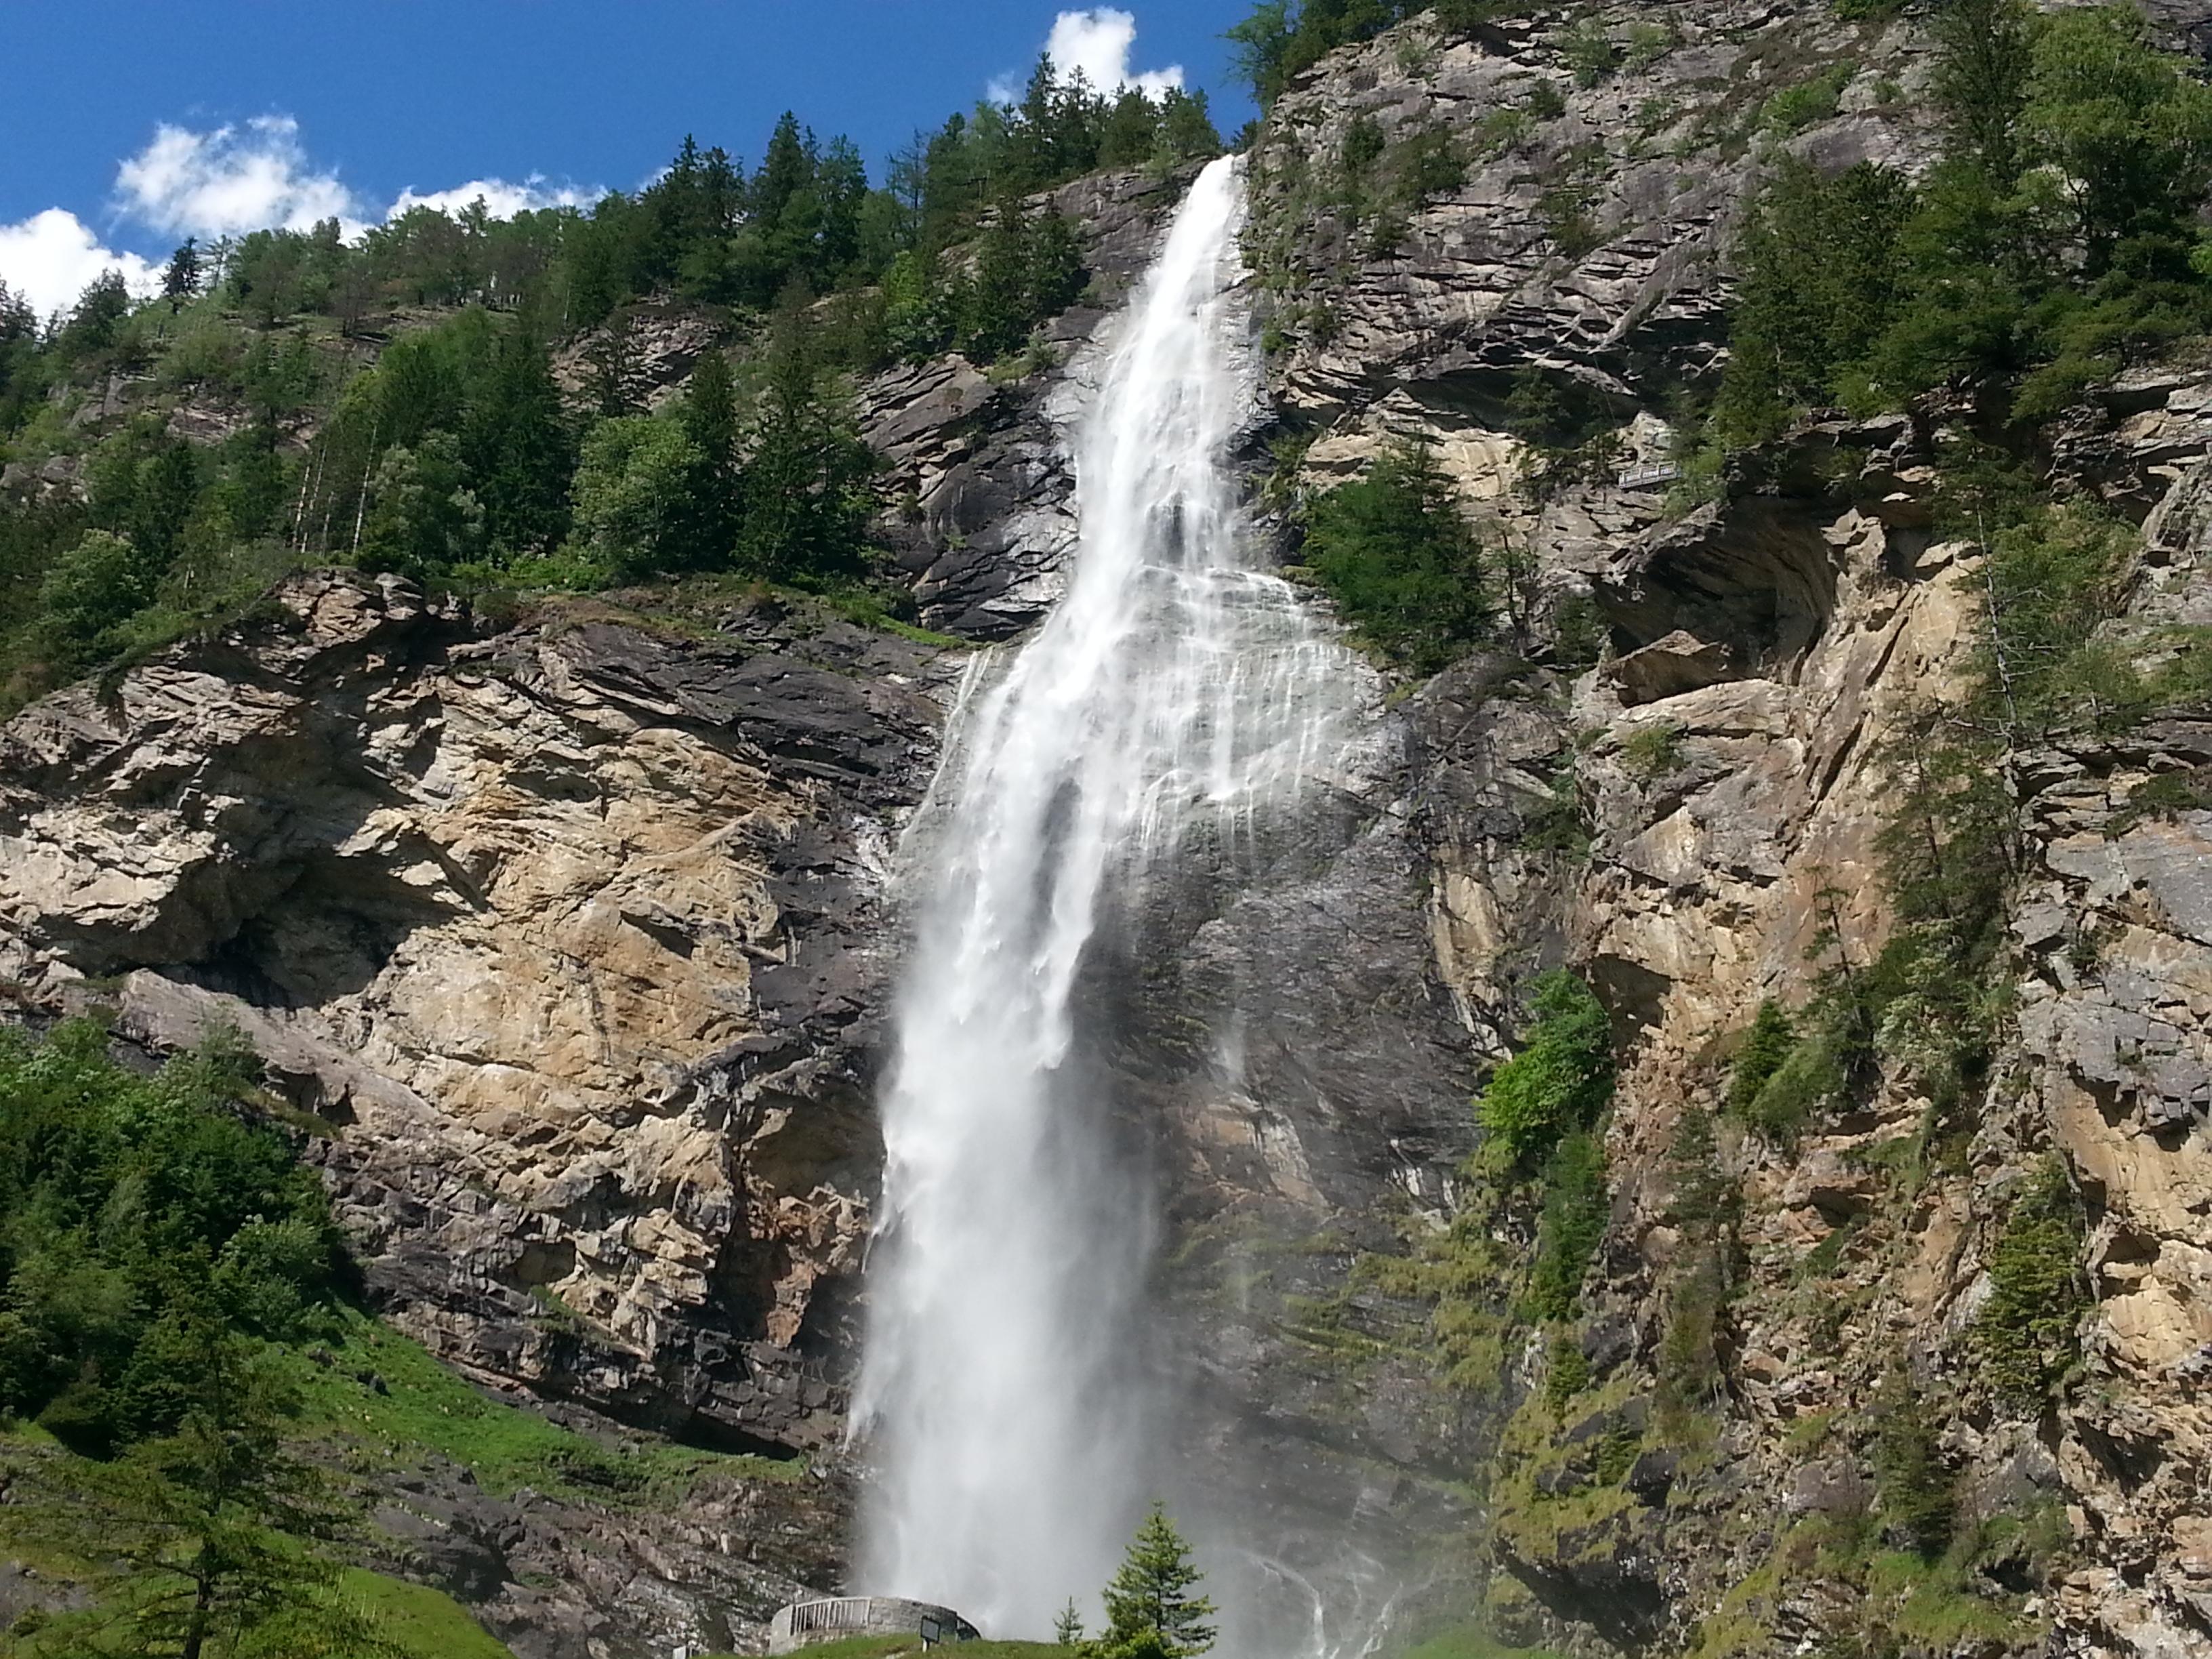 Klettersteig Fallbach : Fallbach klettersteig u2013 wikipedia